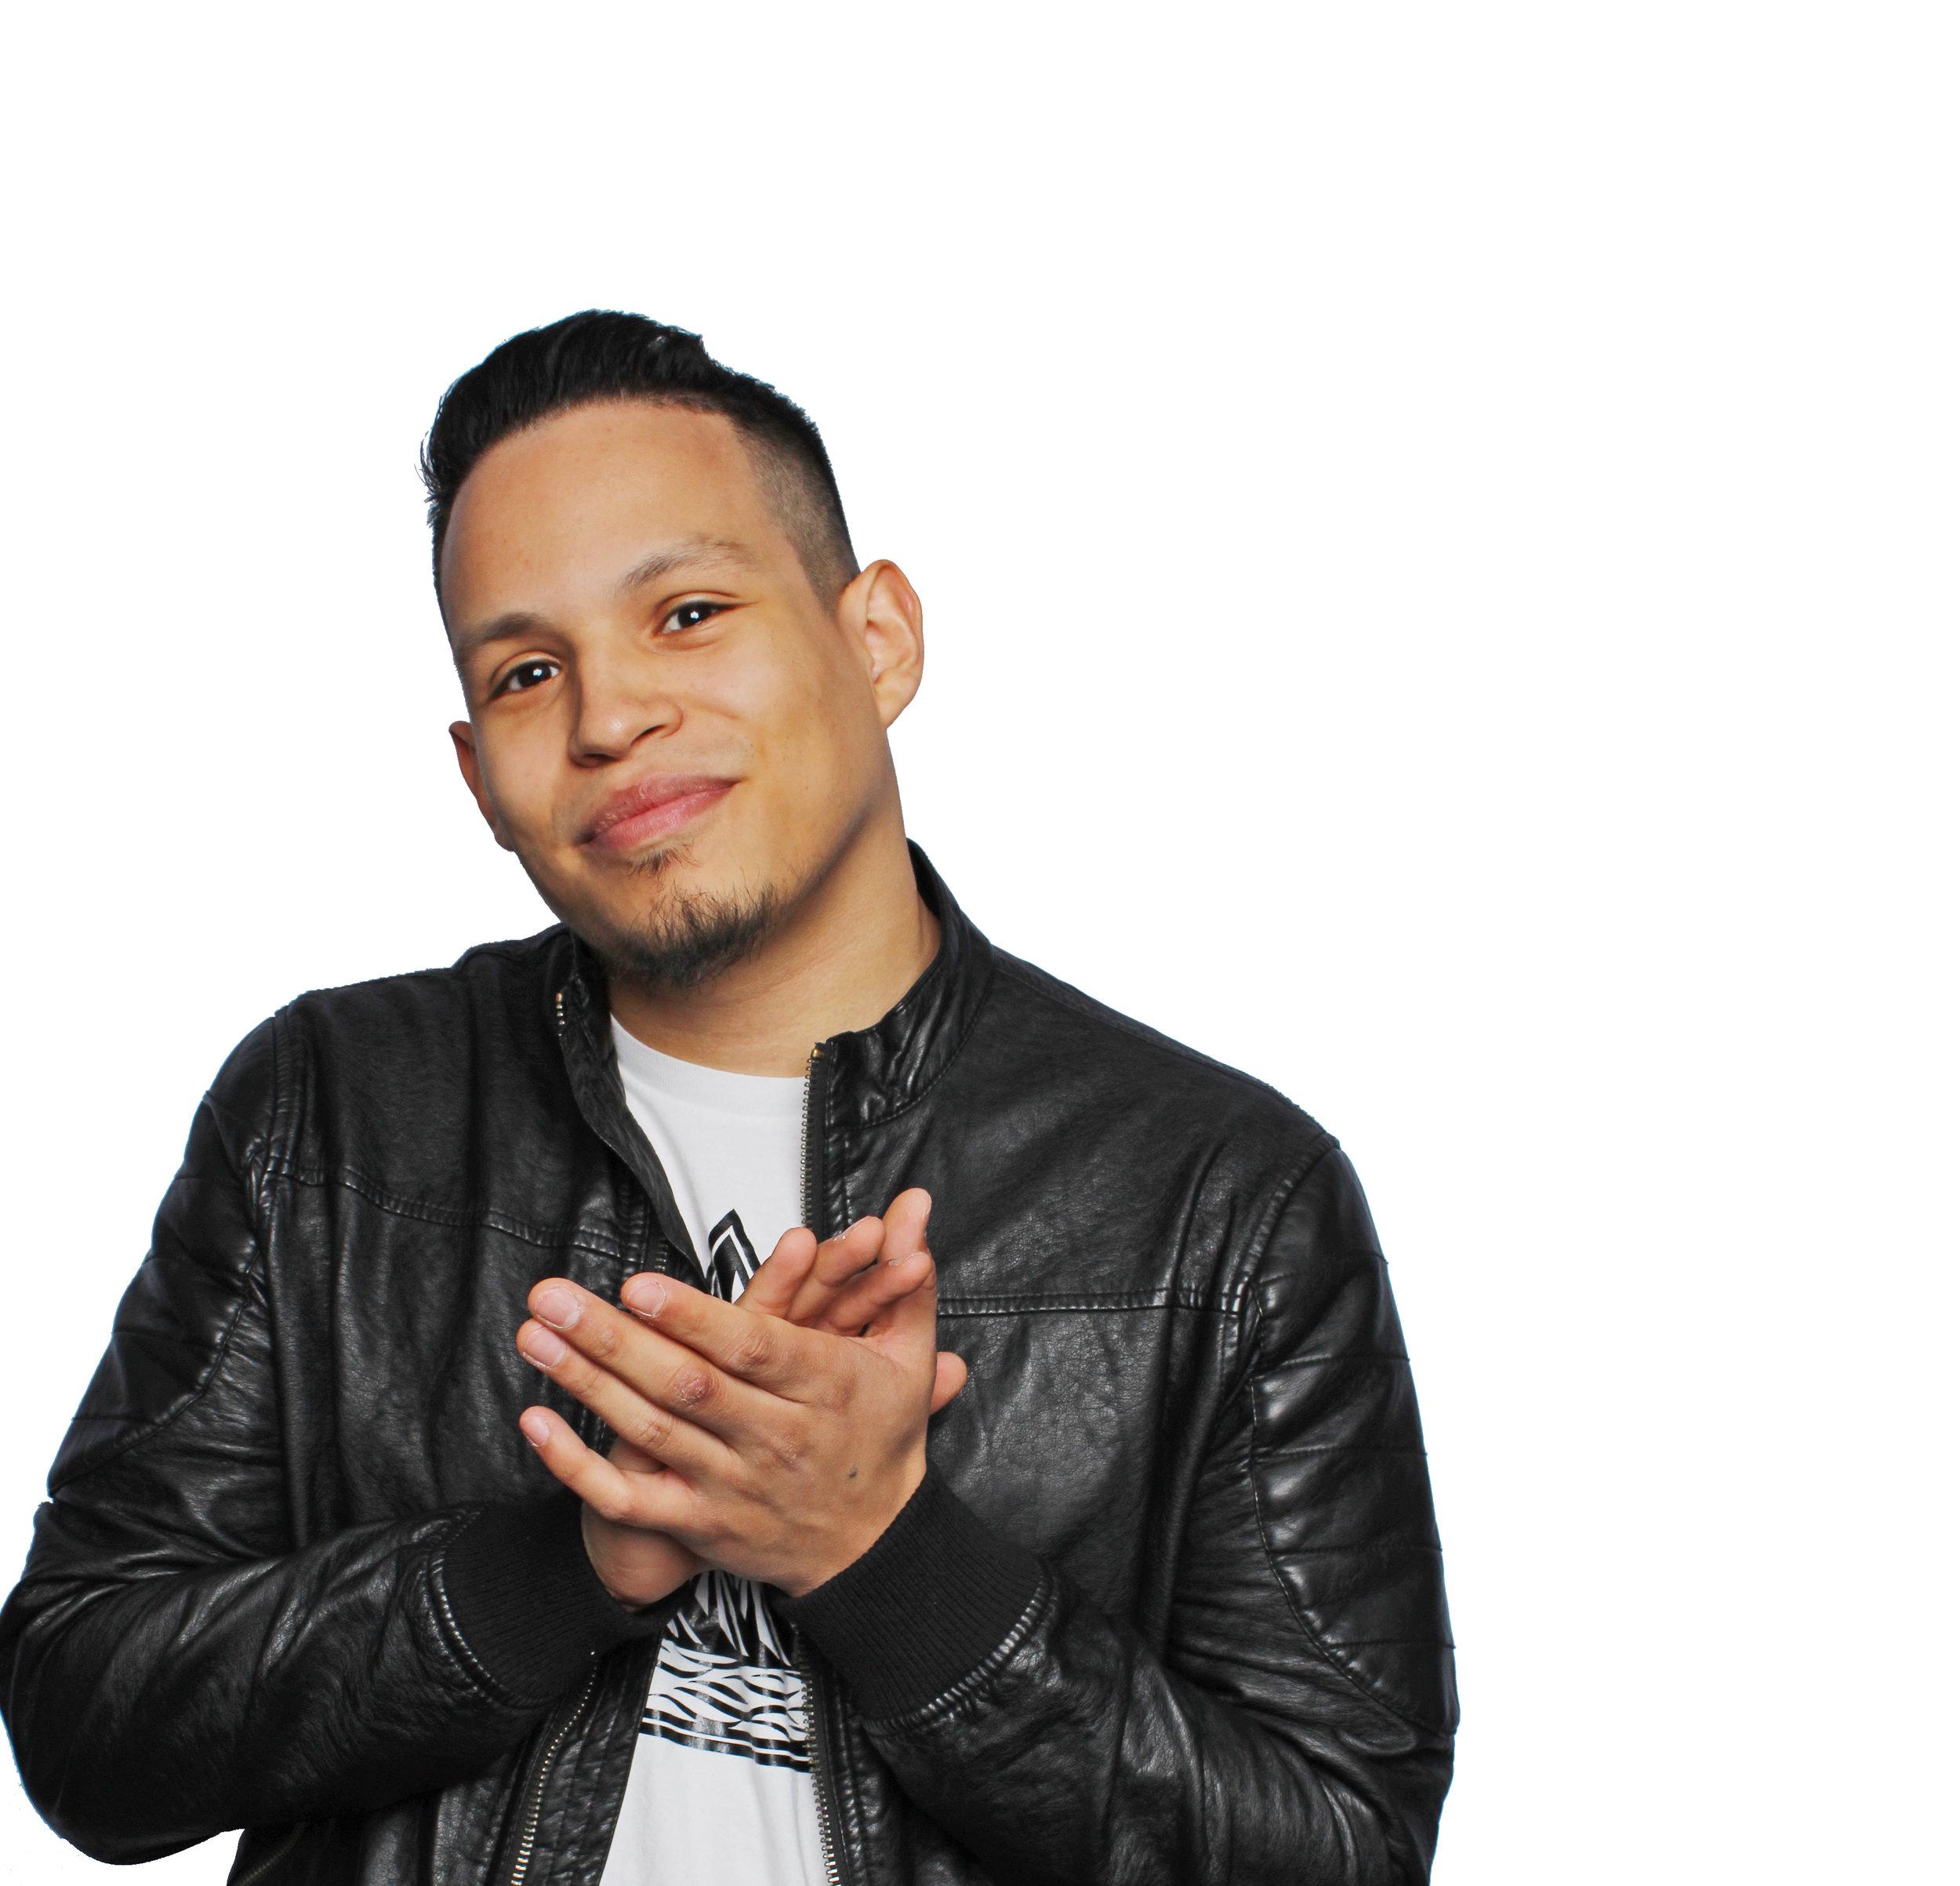 DJ Pedro Headshot2.jpg